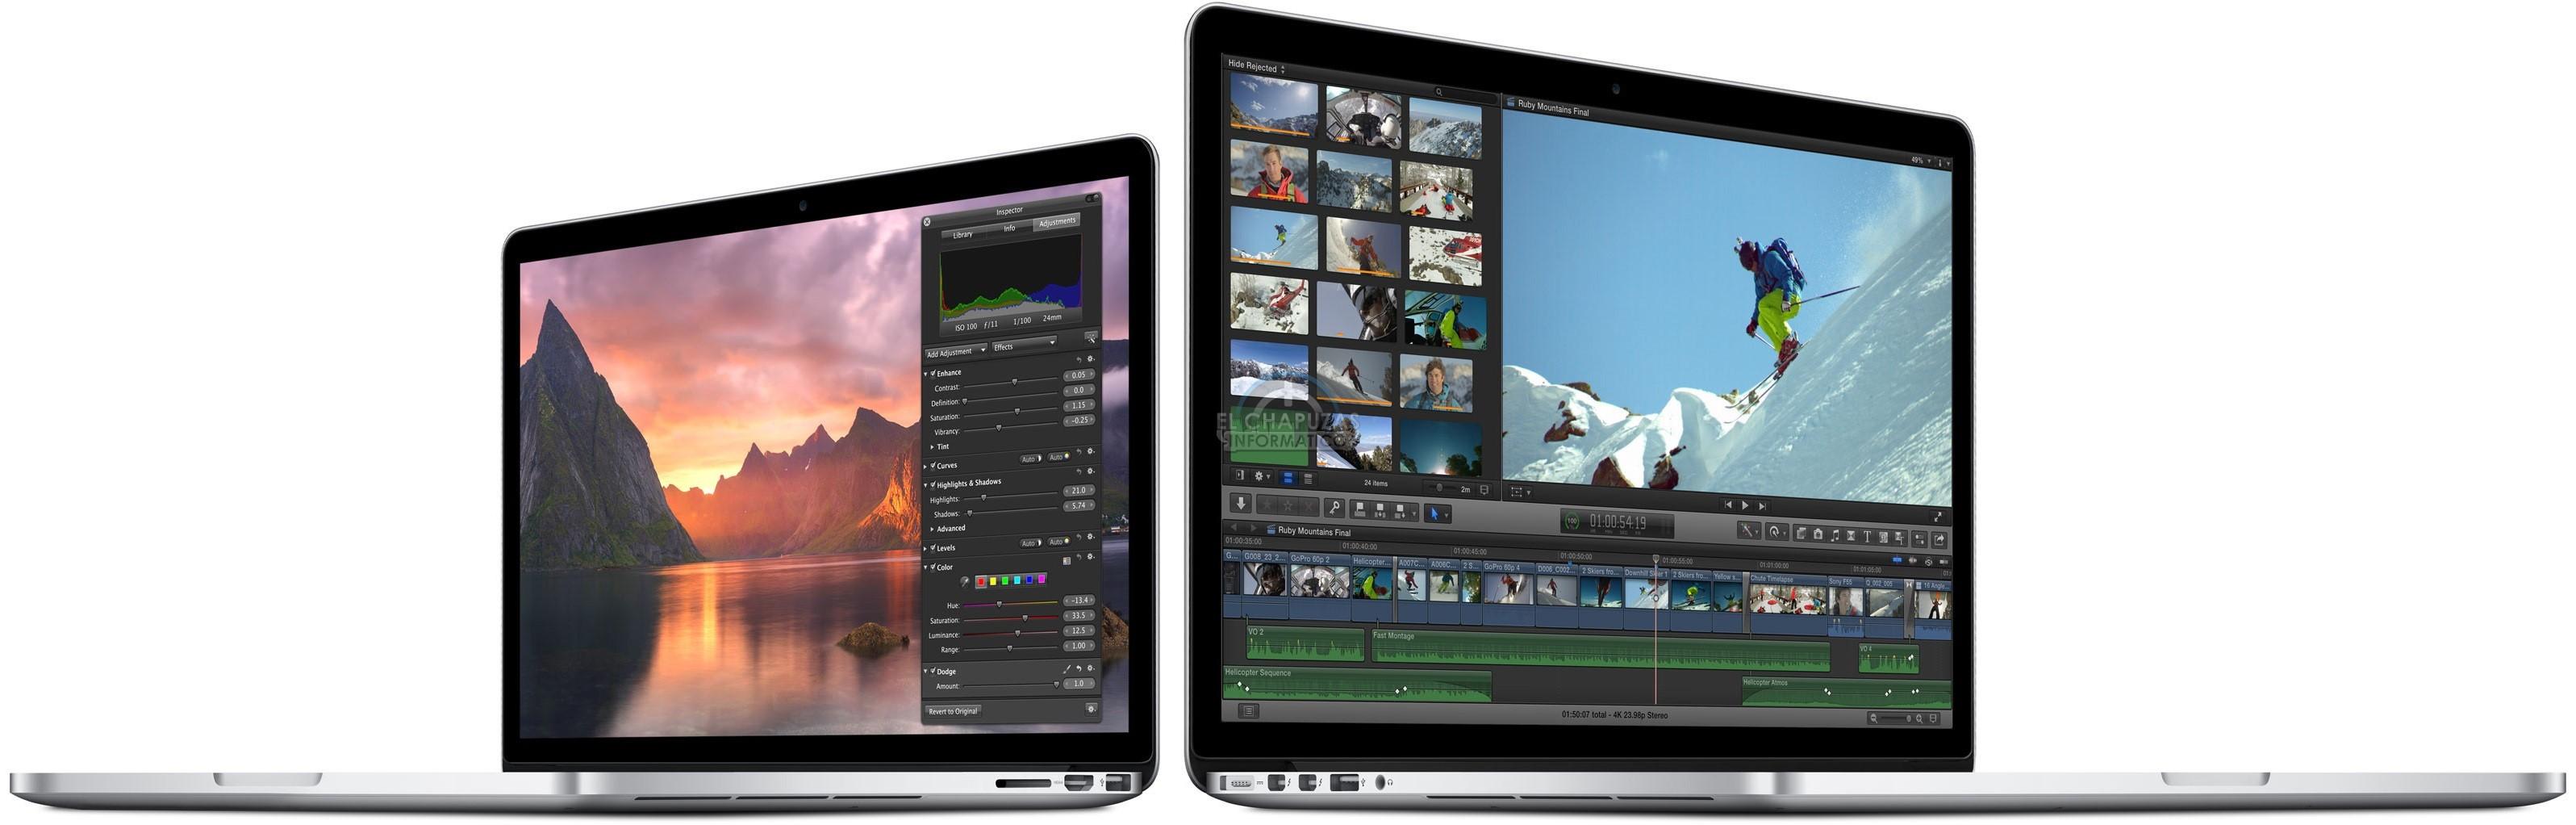 Apple MacBook Pro Retina y MacBook Air 2015